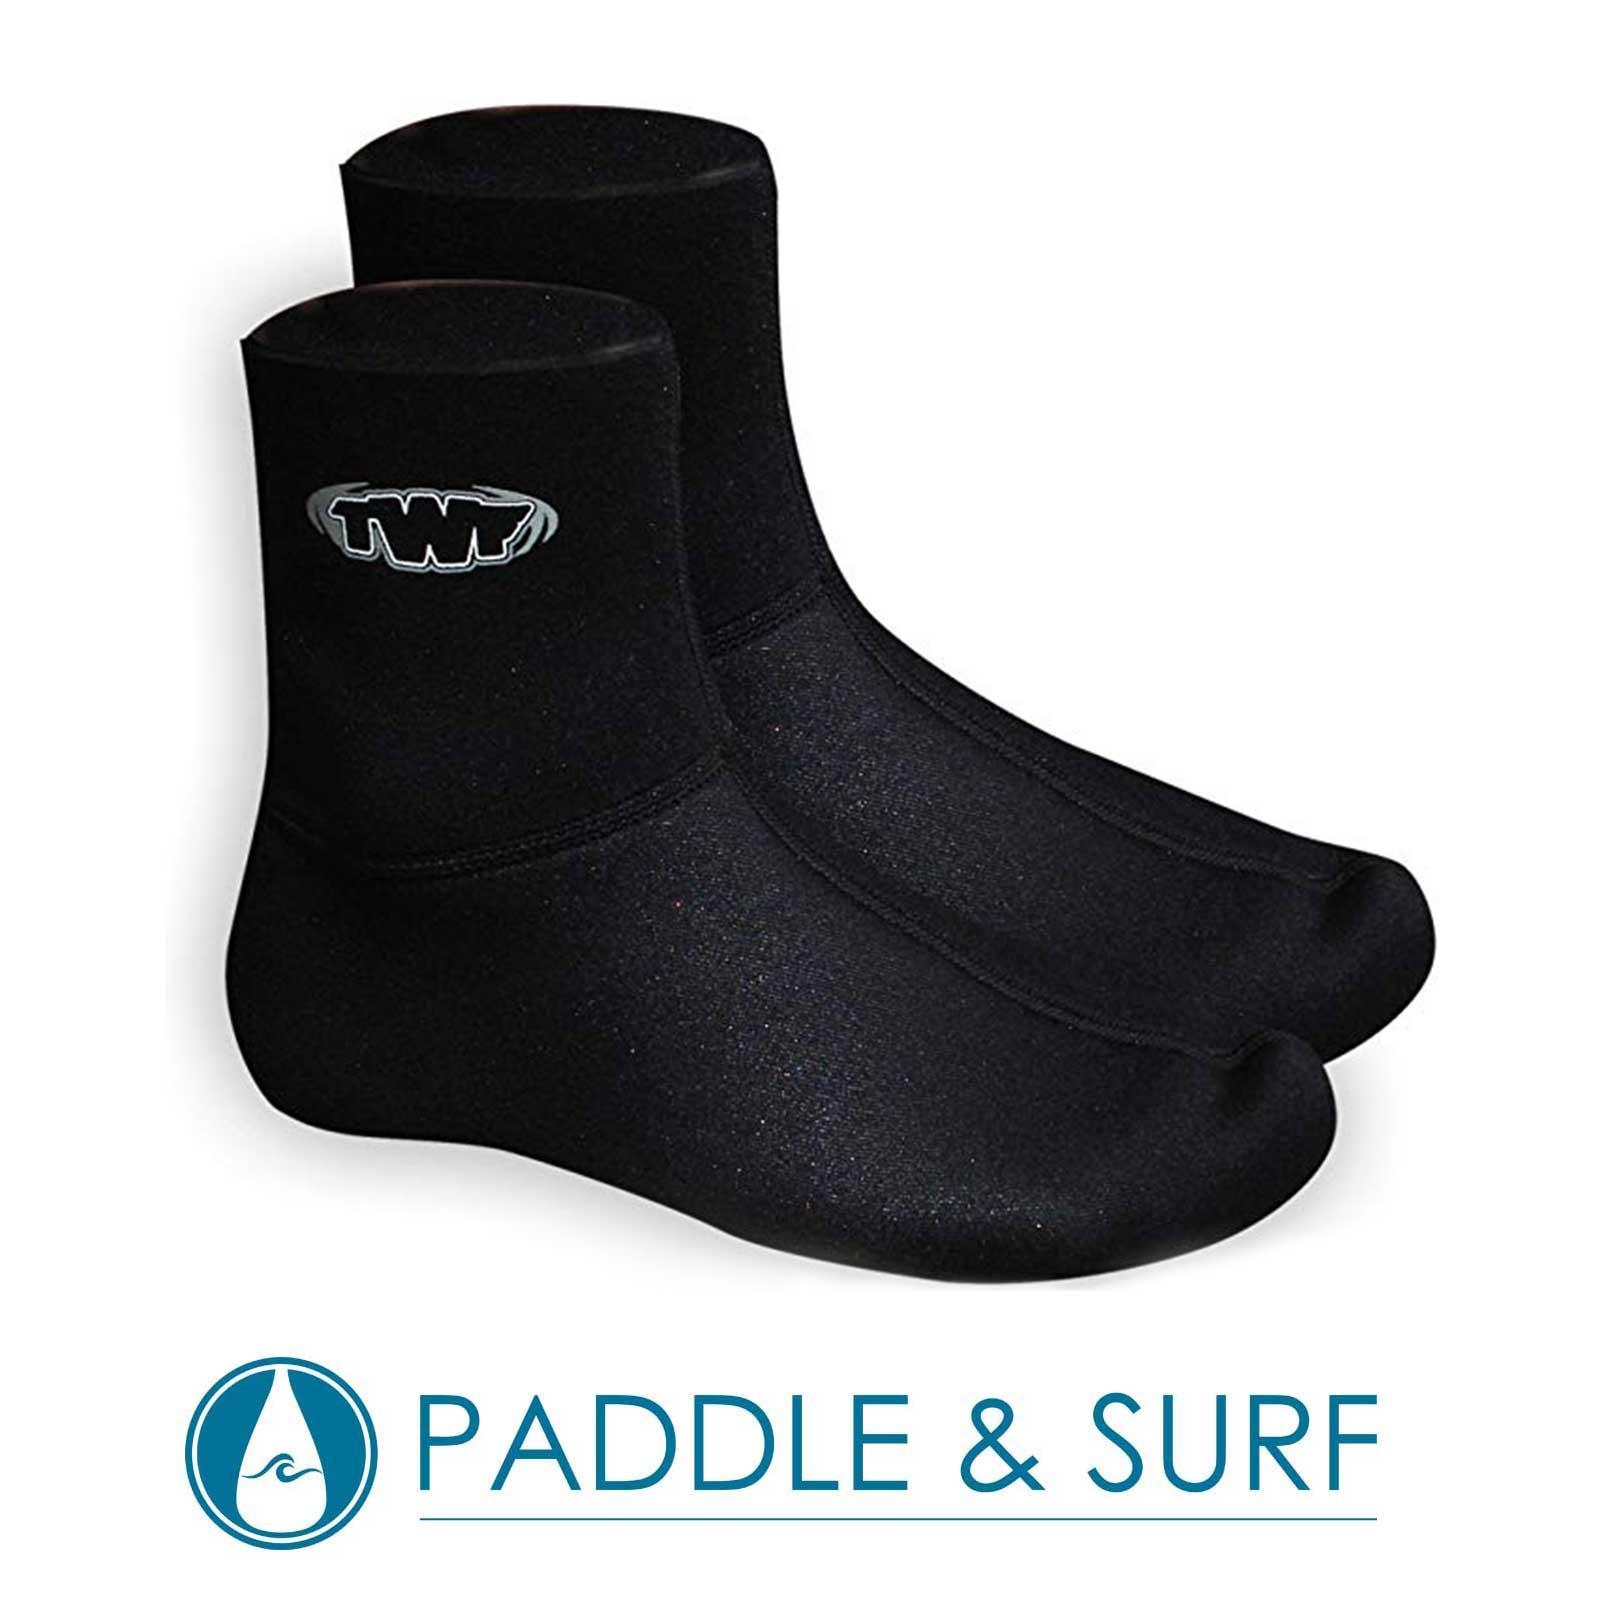 TWF 3mm Neoprene Junior Kids Watersports Mausered Sox